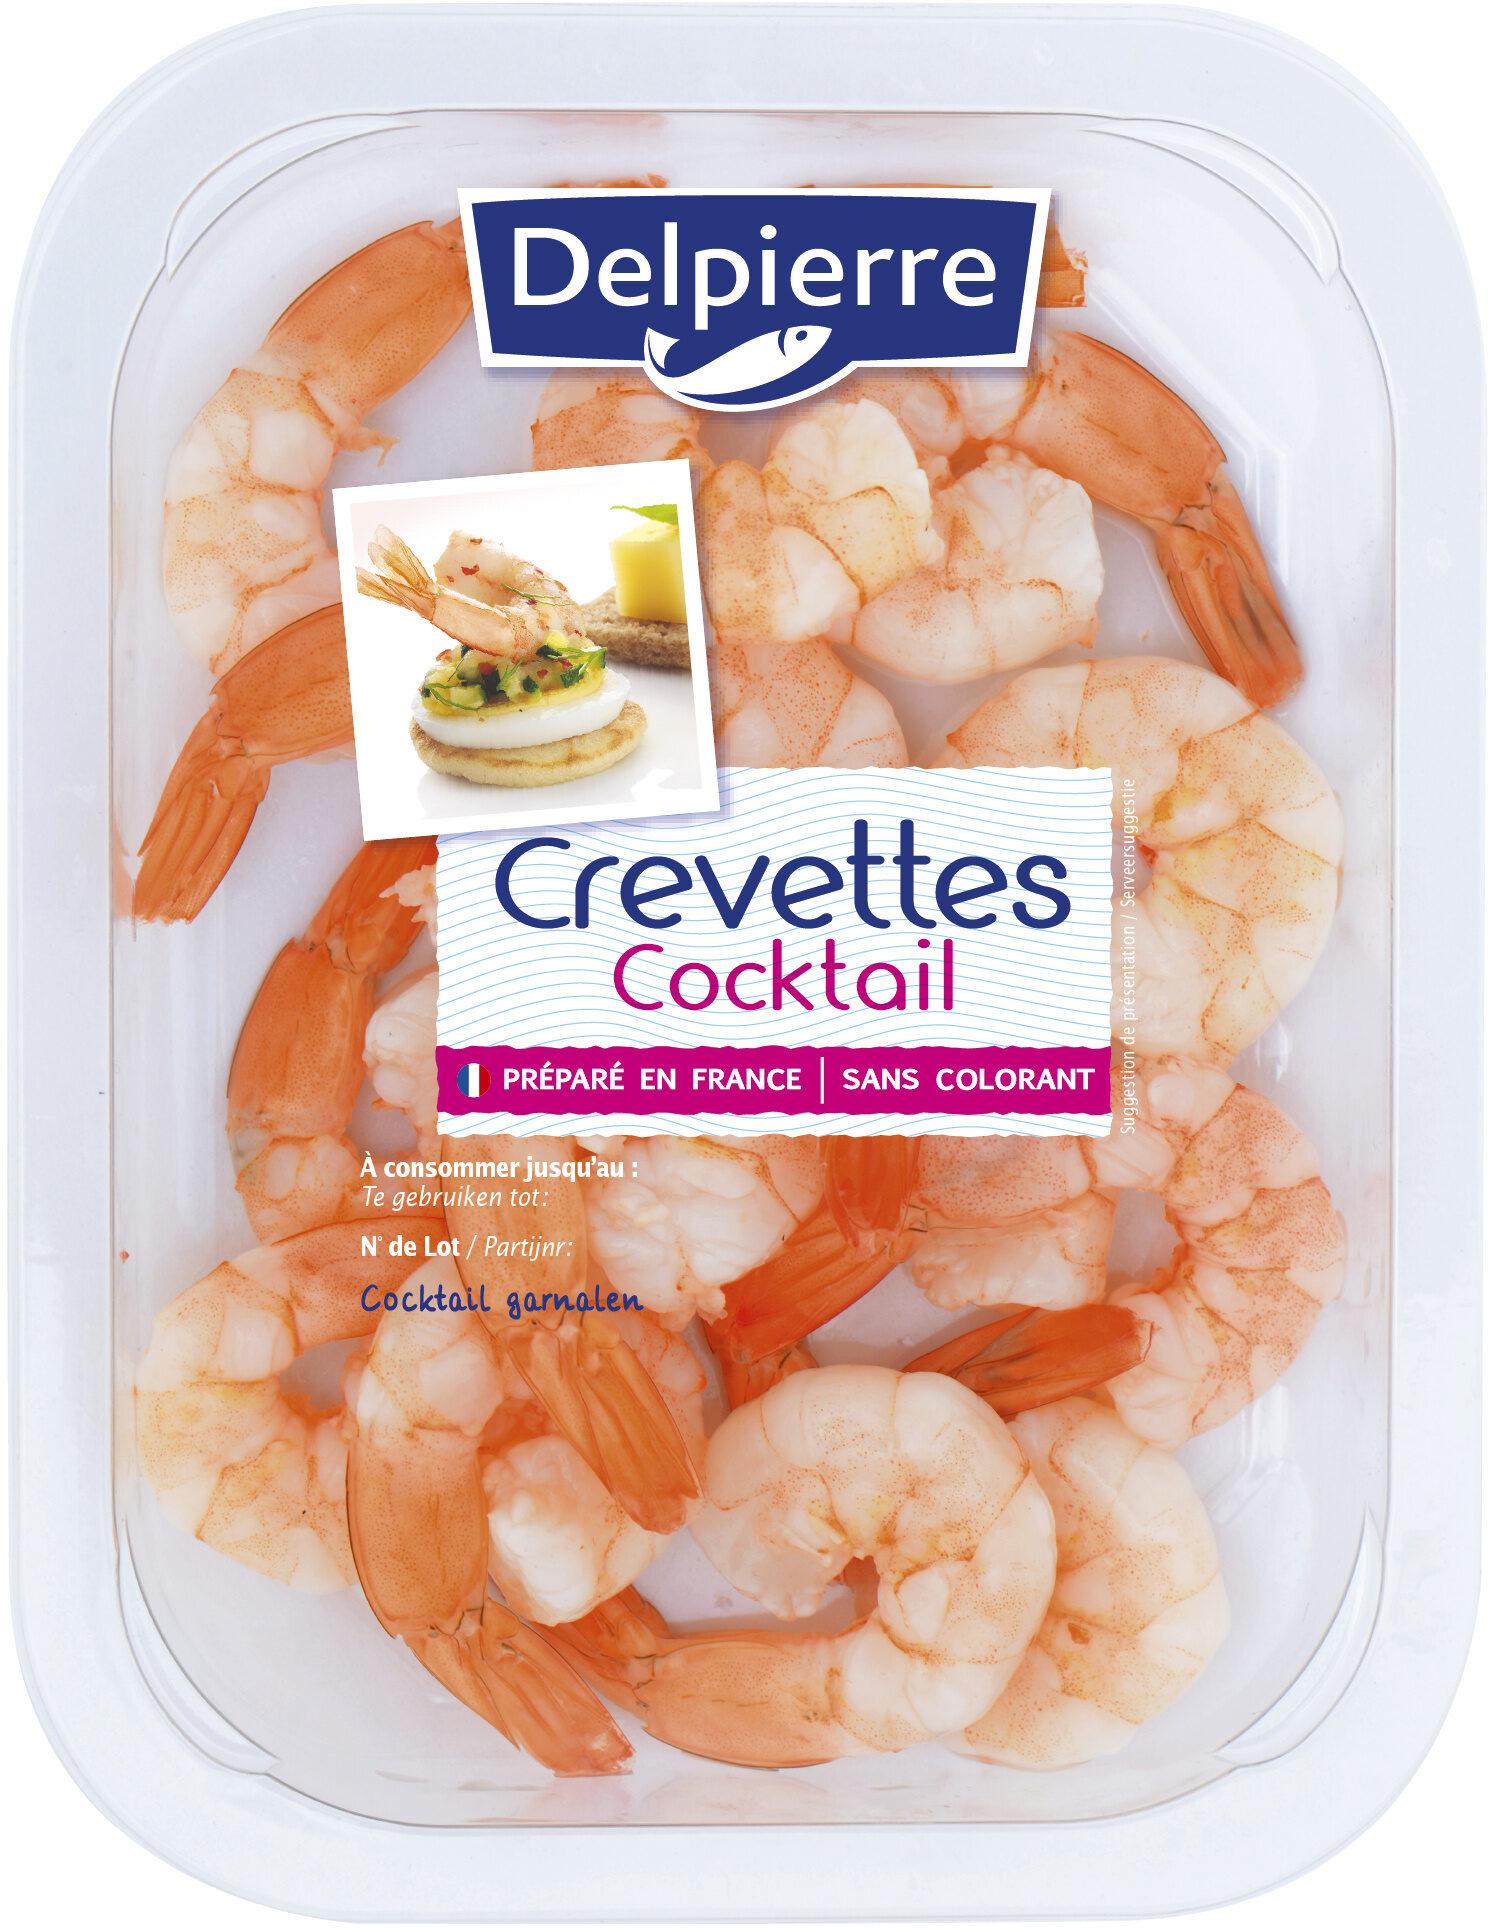 Crevettes cocktail - Product - fr